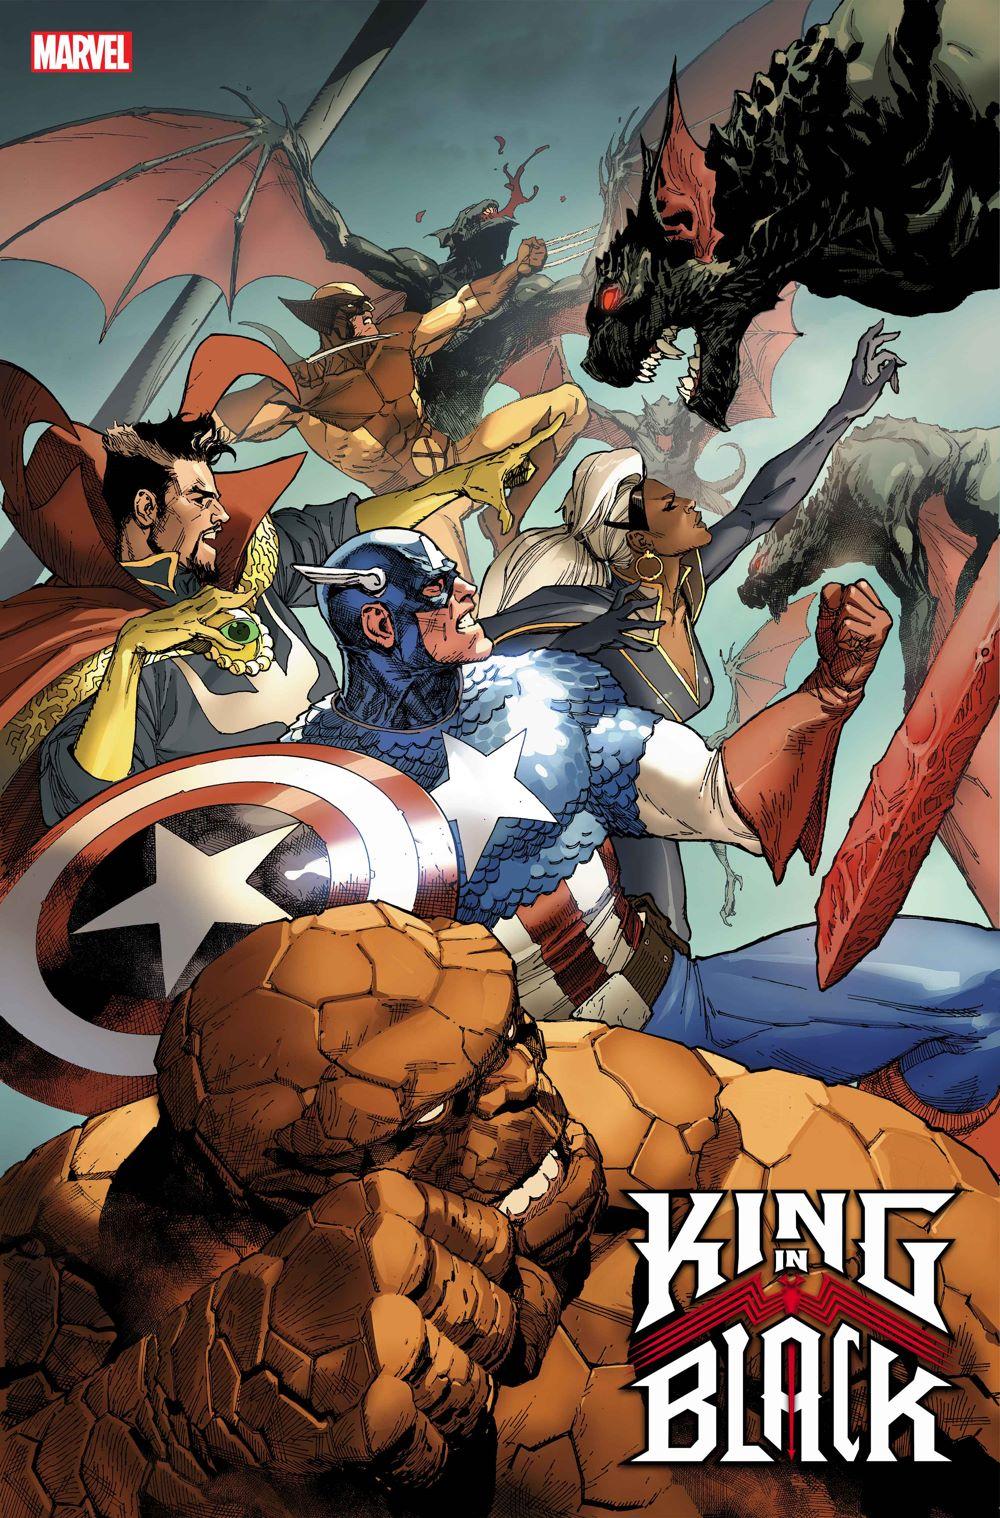 KINGINBLACK2020001_YU_DC71 Marvel reveals variant covers for KING IN BLACK #1